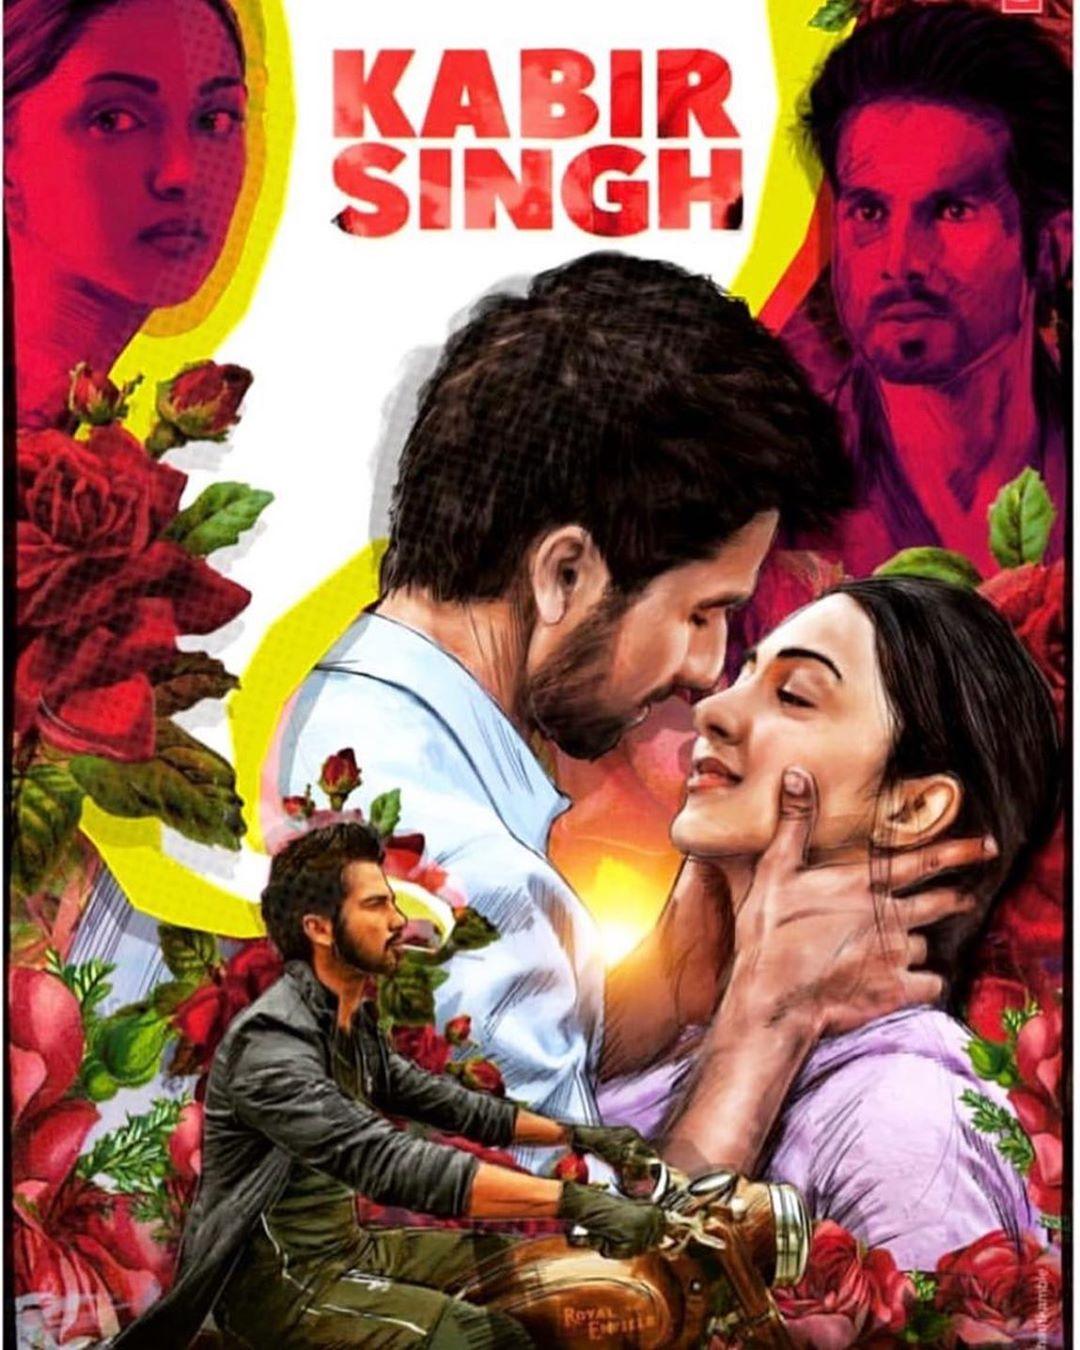 Kabir Singh Scores A Sensational 235 Crore At The Domestic Box